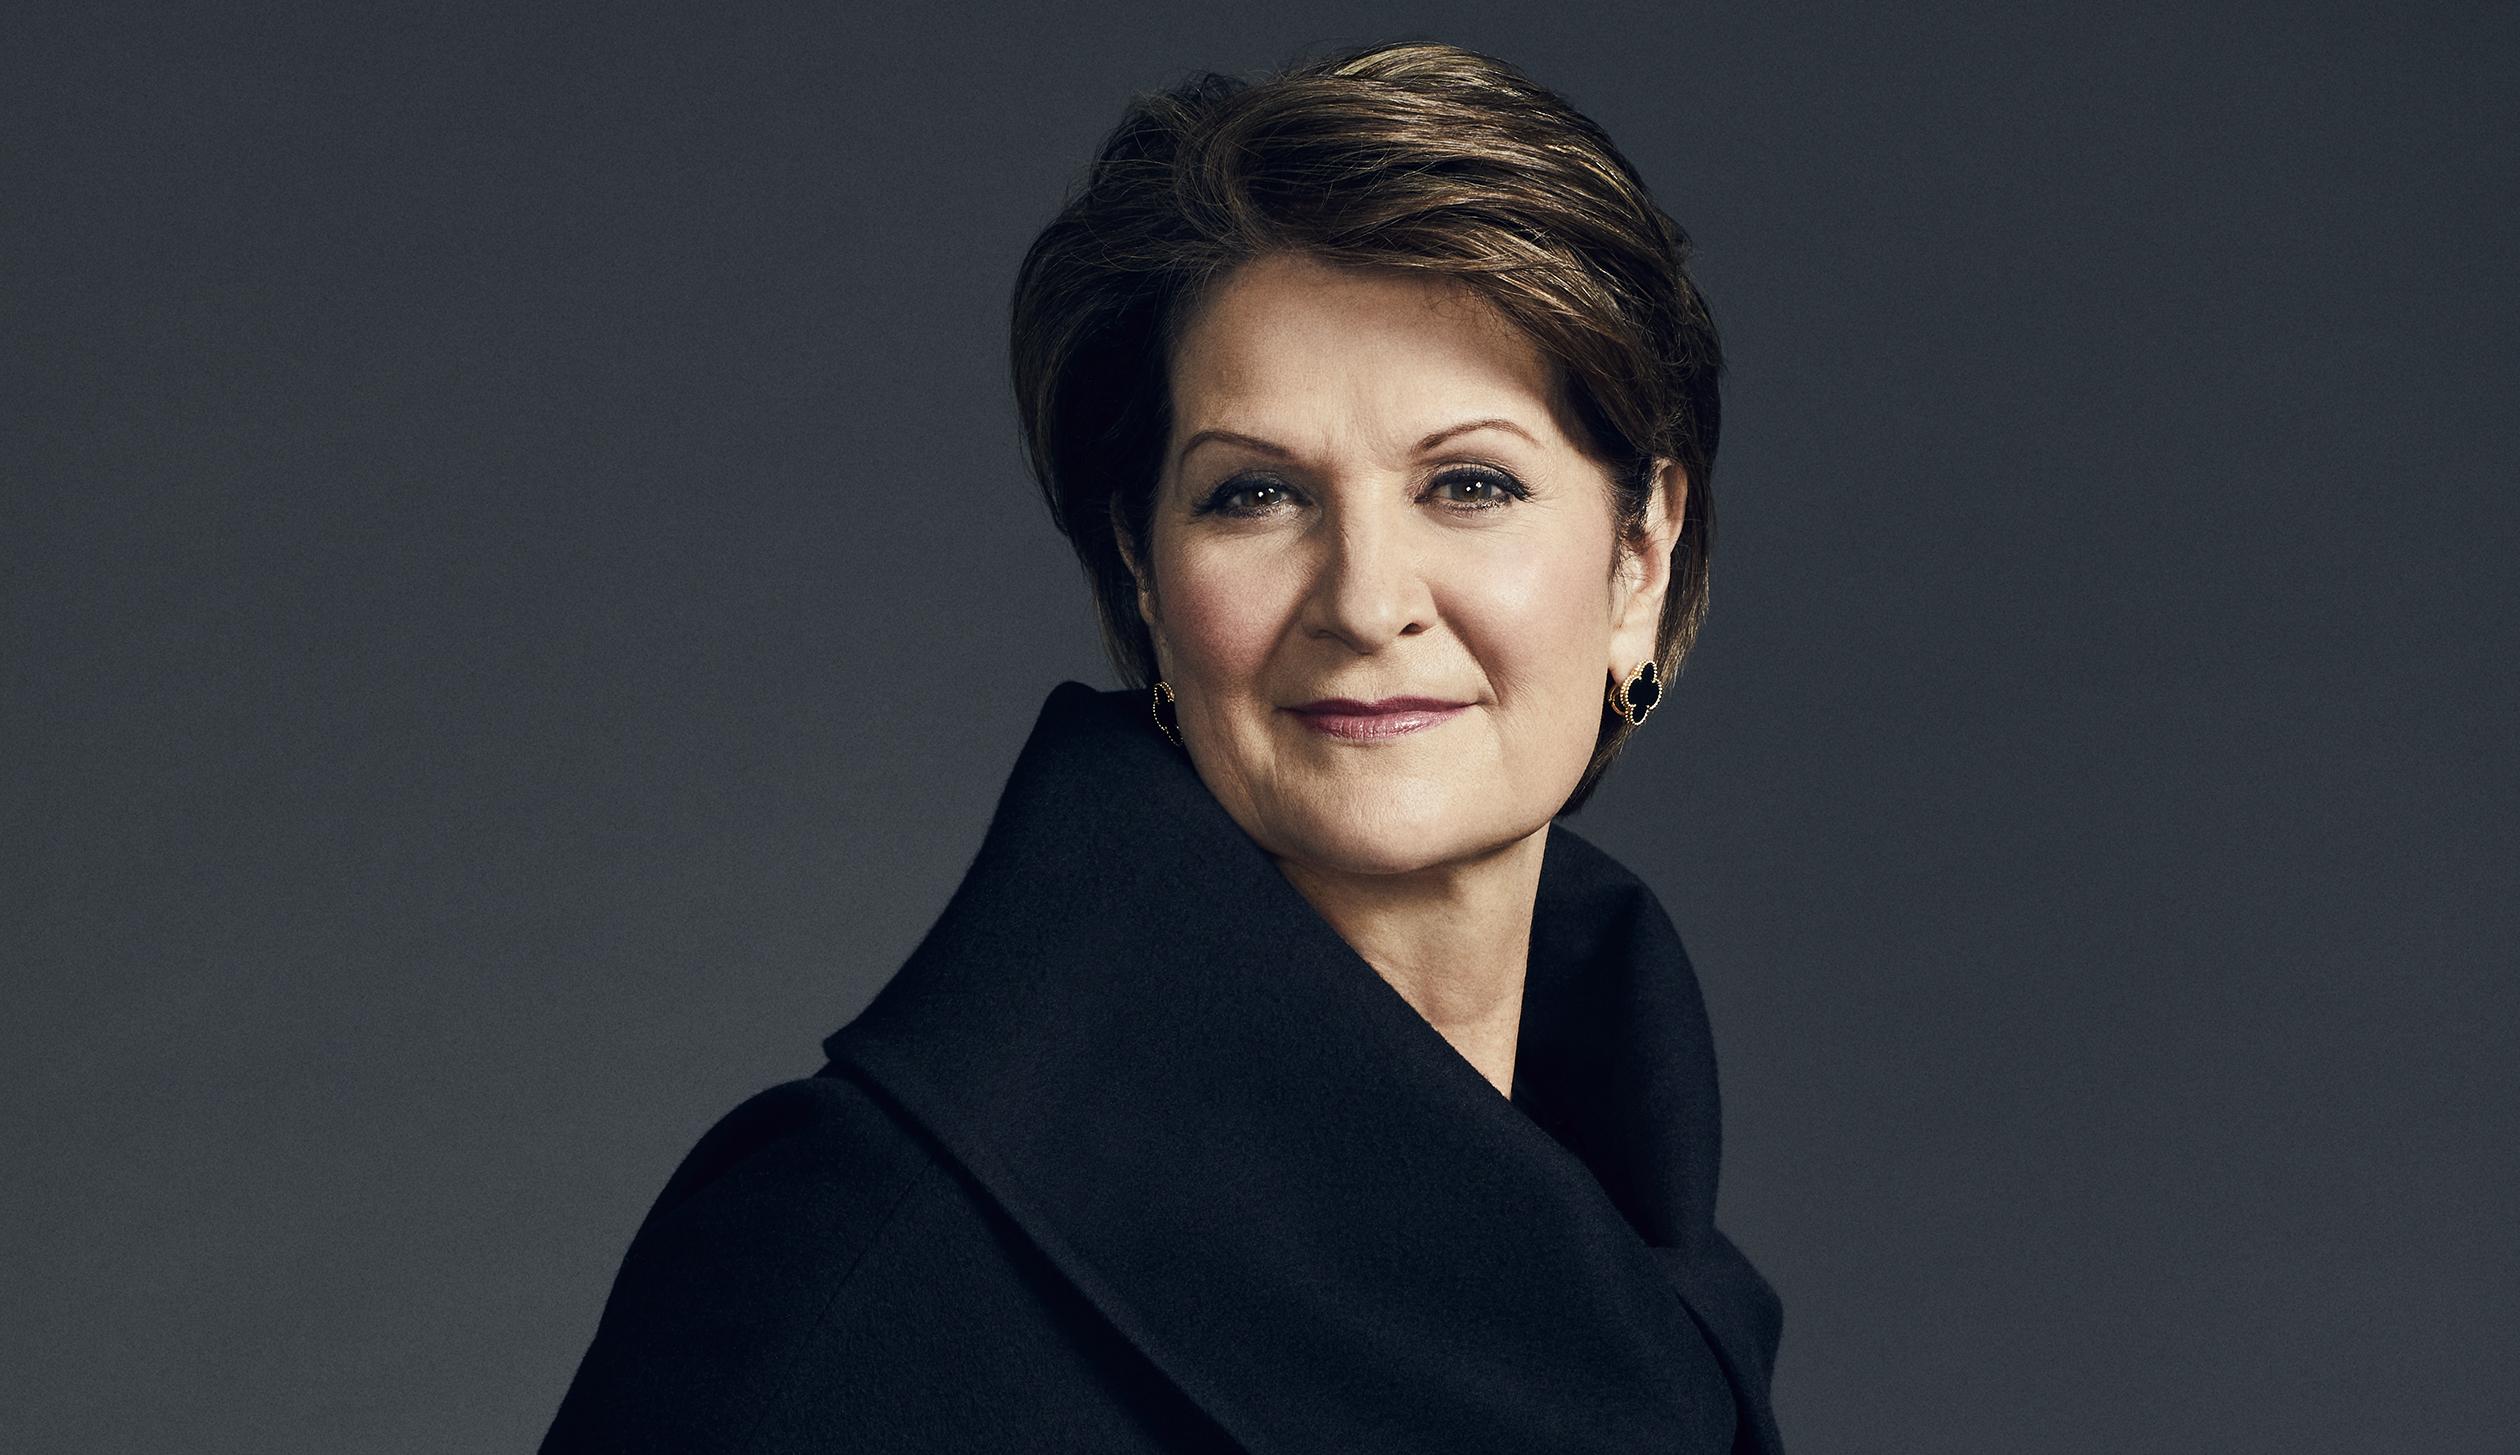 Marillyn Hewson, CEO, Lockheed Martin